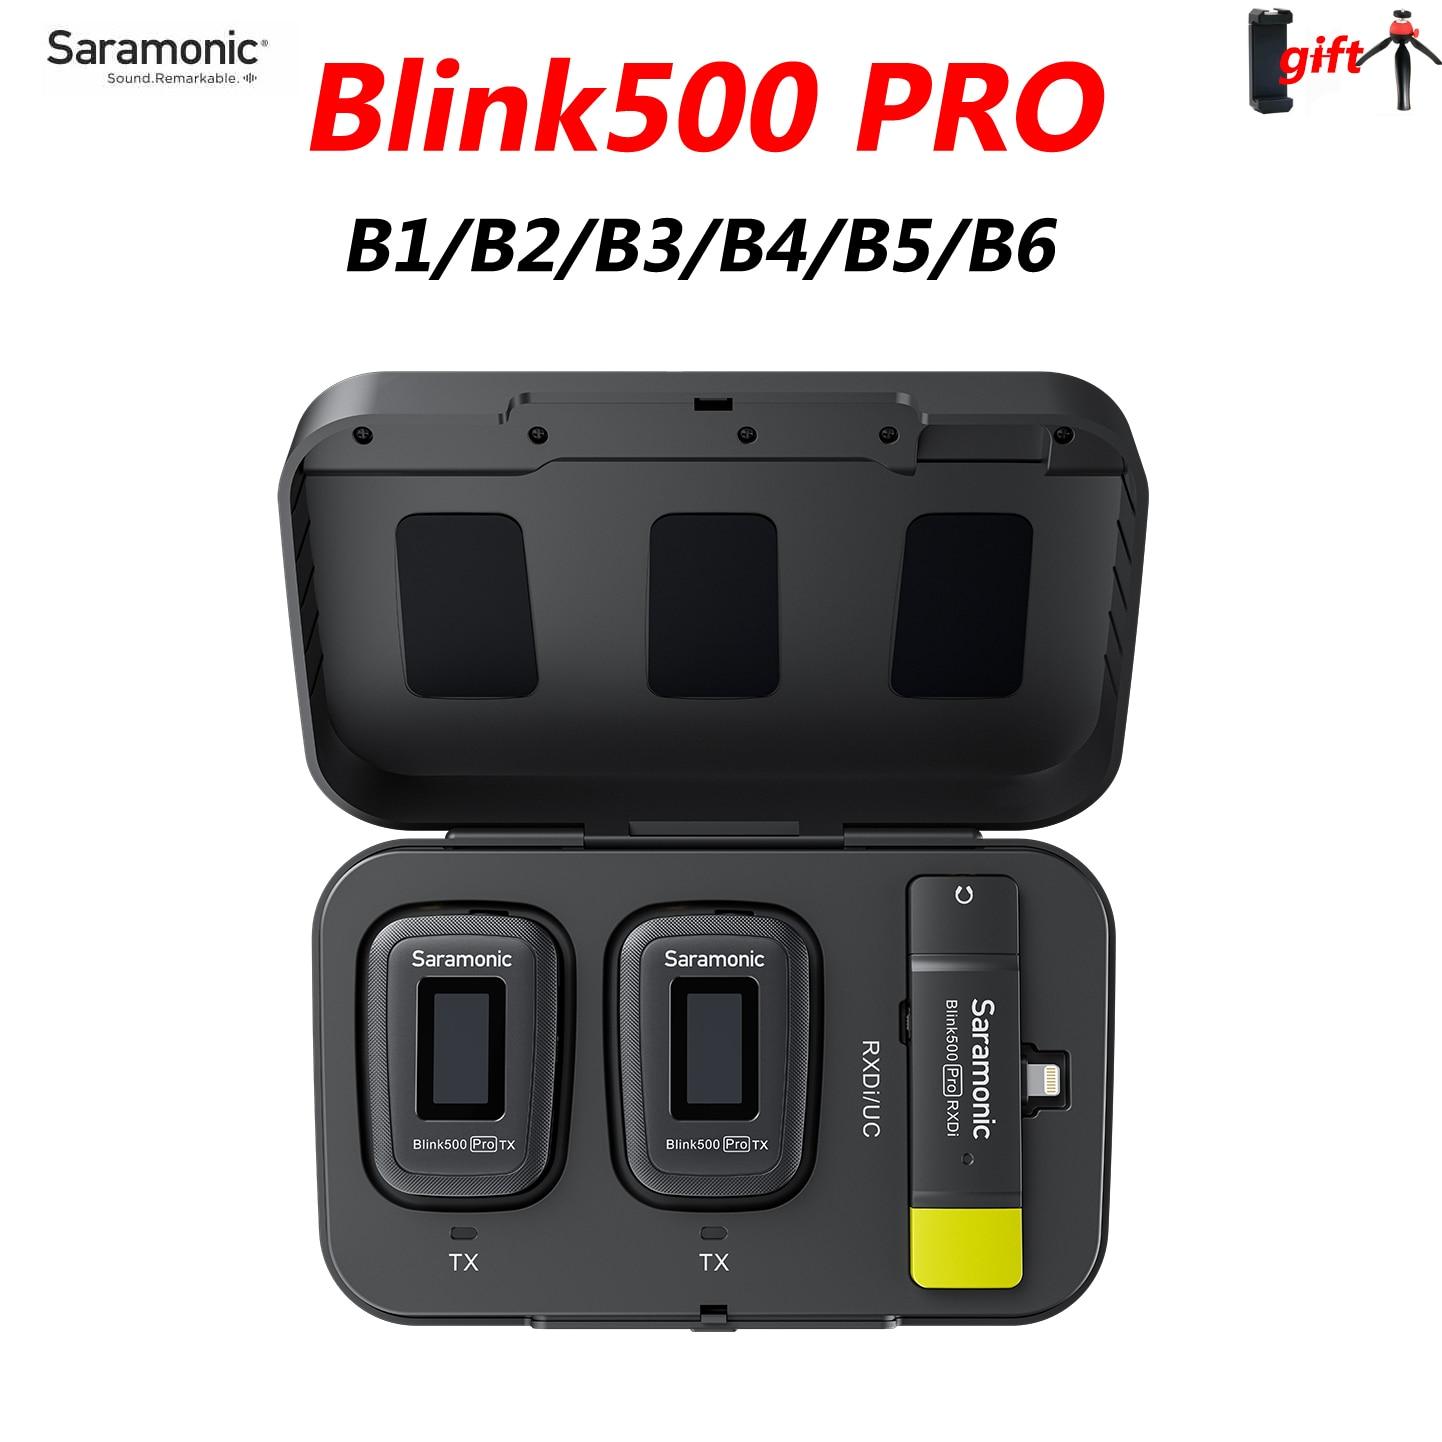 Get Saramonic Blink500 Blink 500 Pro B3 B4 B5 B6 B1 B2 Wireless Lavalier Microphone Condenser Mic for Android Phone IPhone camera